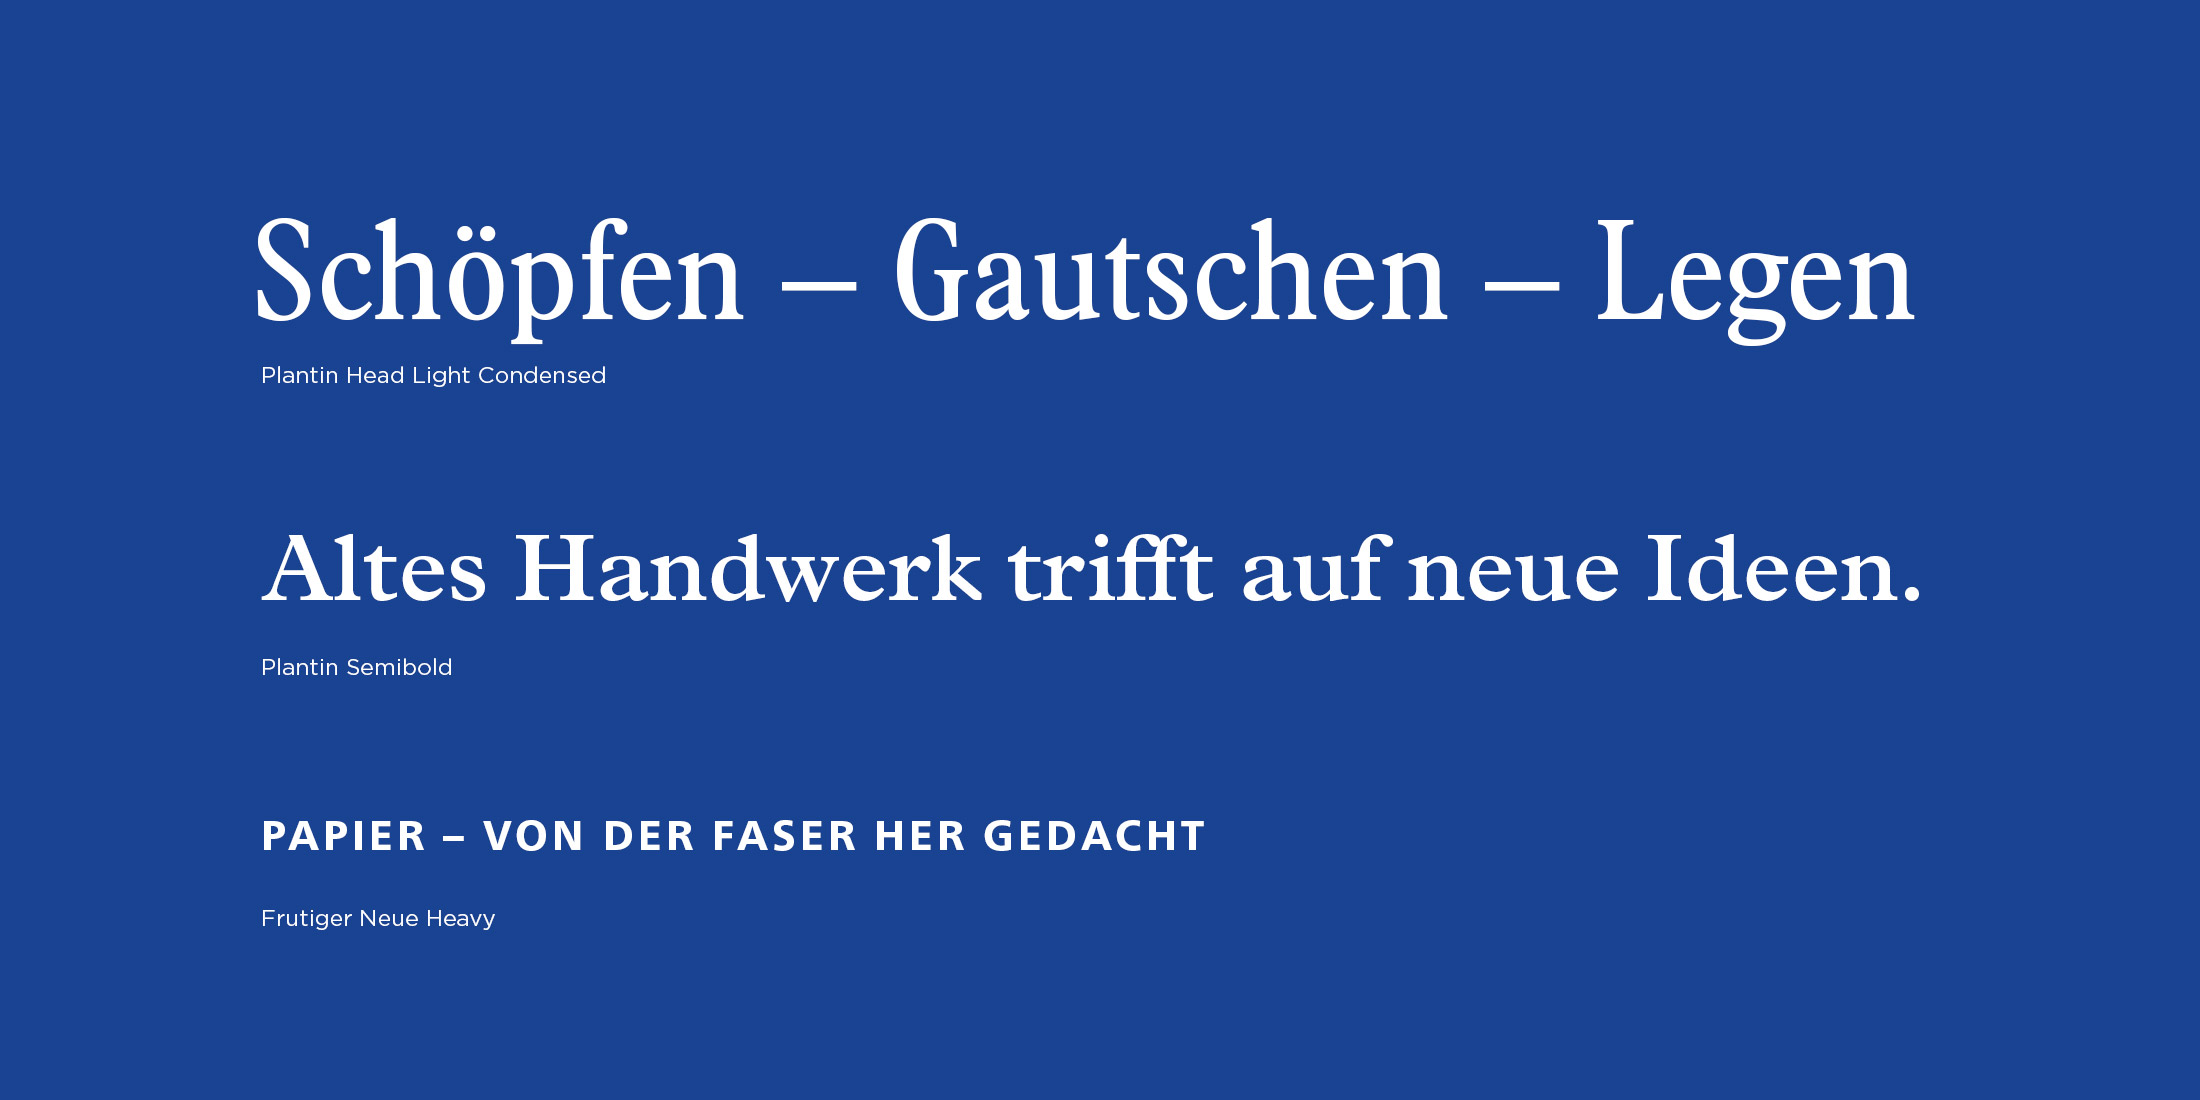 Papieroffizin Matthias Schwethelm – Logo-Relaunch, Corporate Design, Hausschrift von ELLIJOT